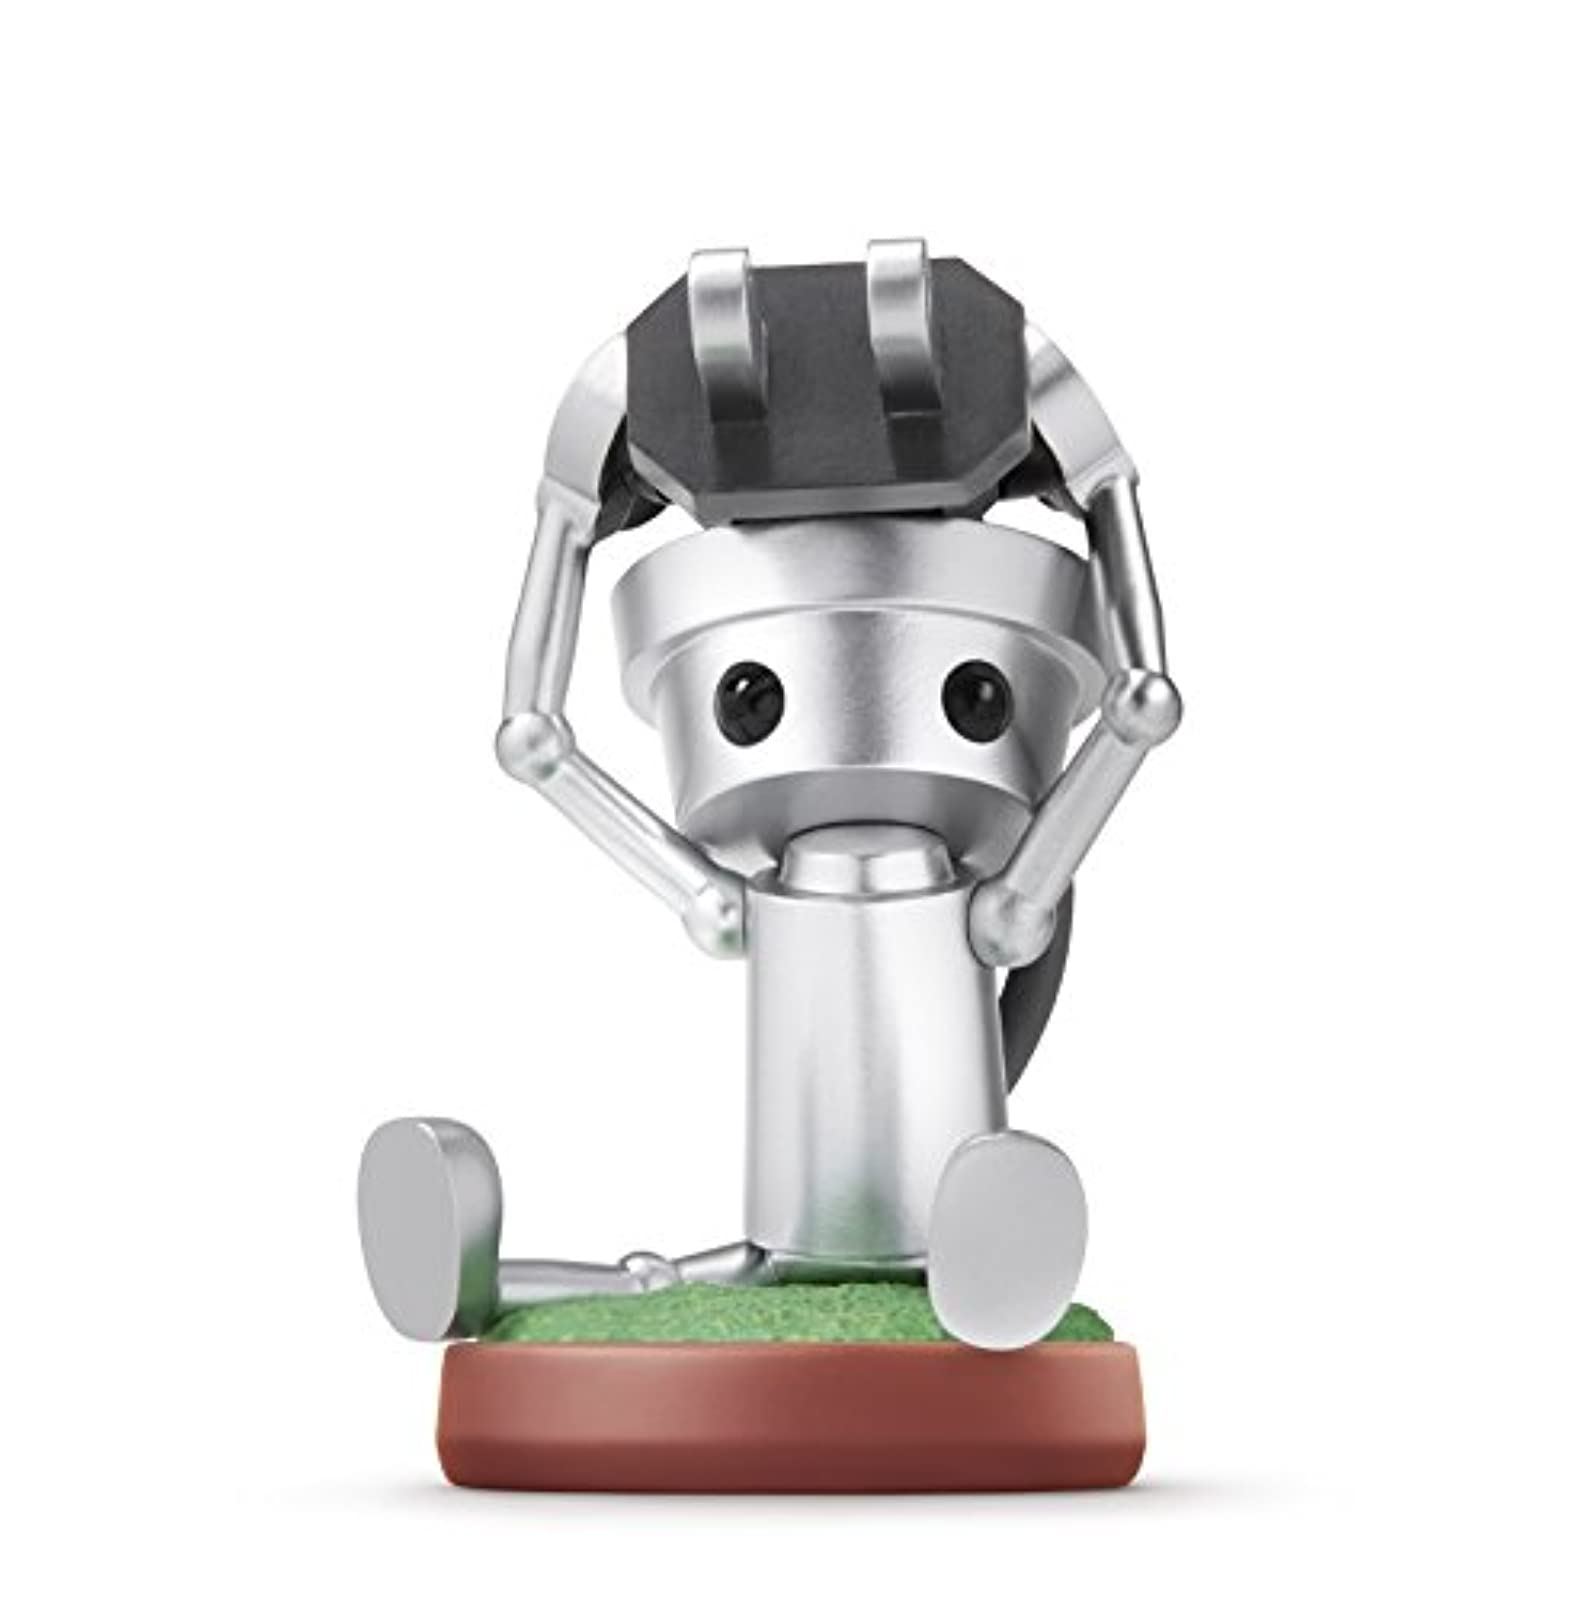 Chibi-Robo Amiibo For 3DS